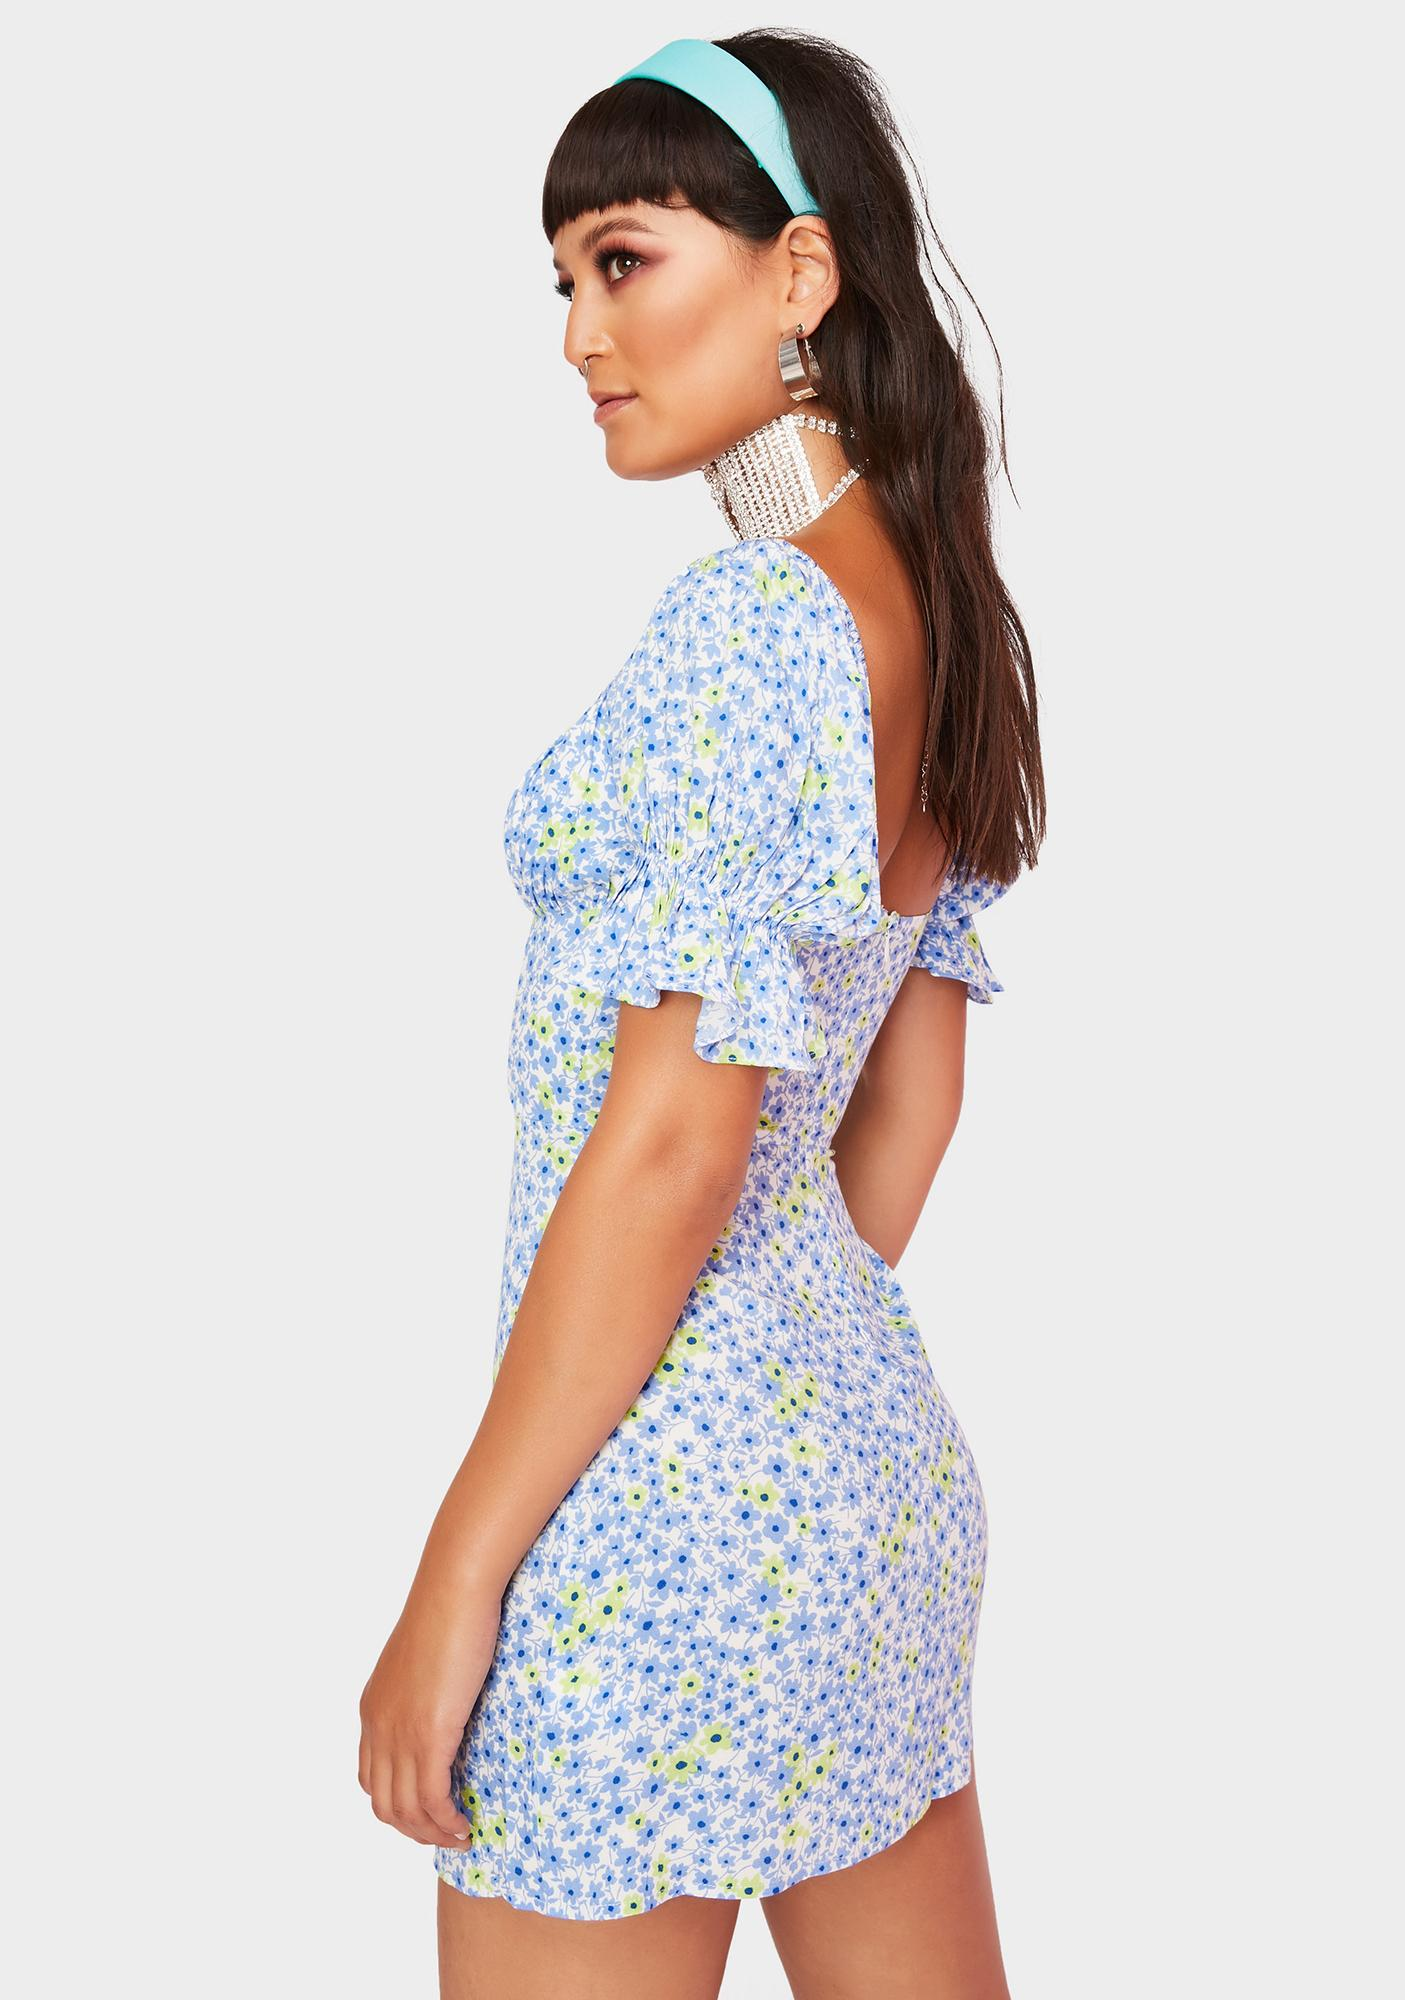 Cloudless Poppyseed Dream Mini Dress